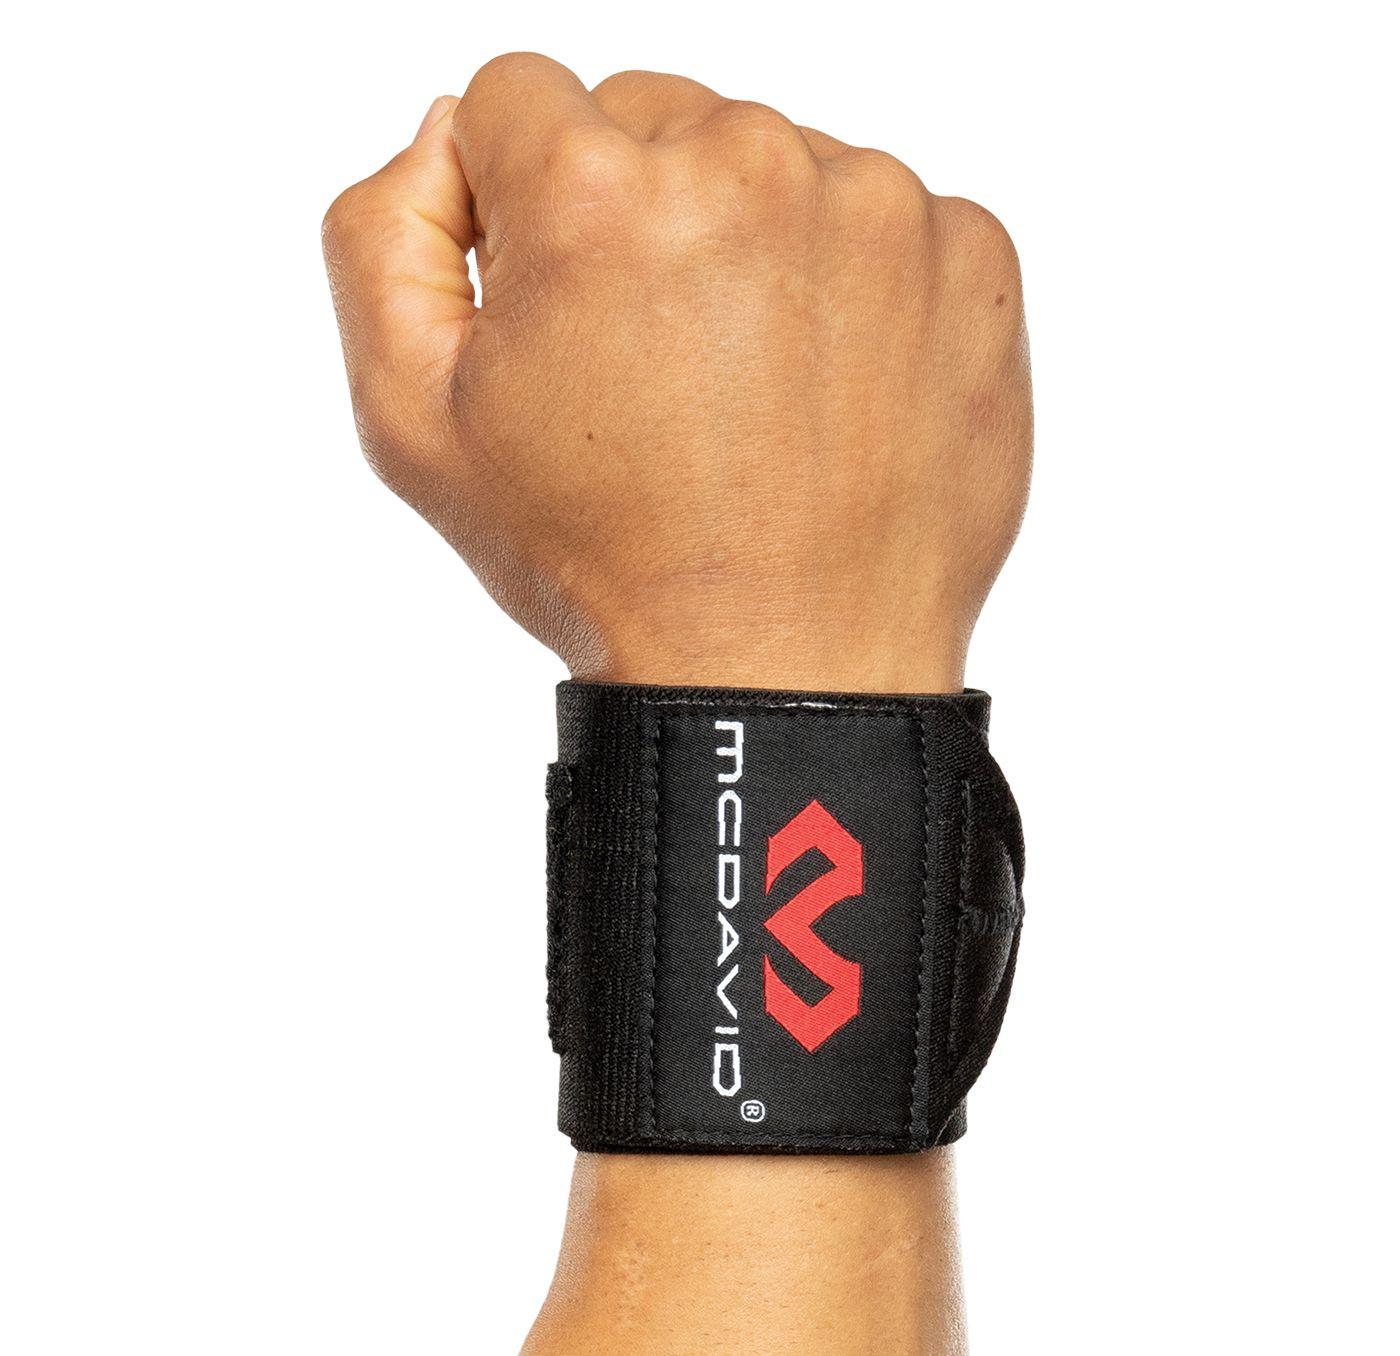 McDavid Weightlifting Elastic Wrist Straps